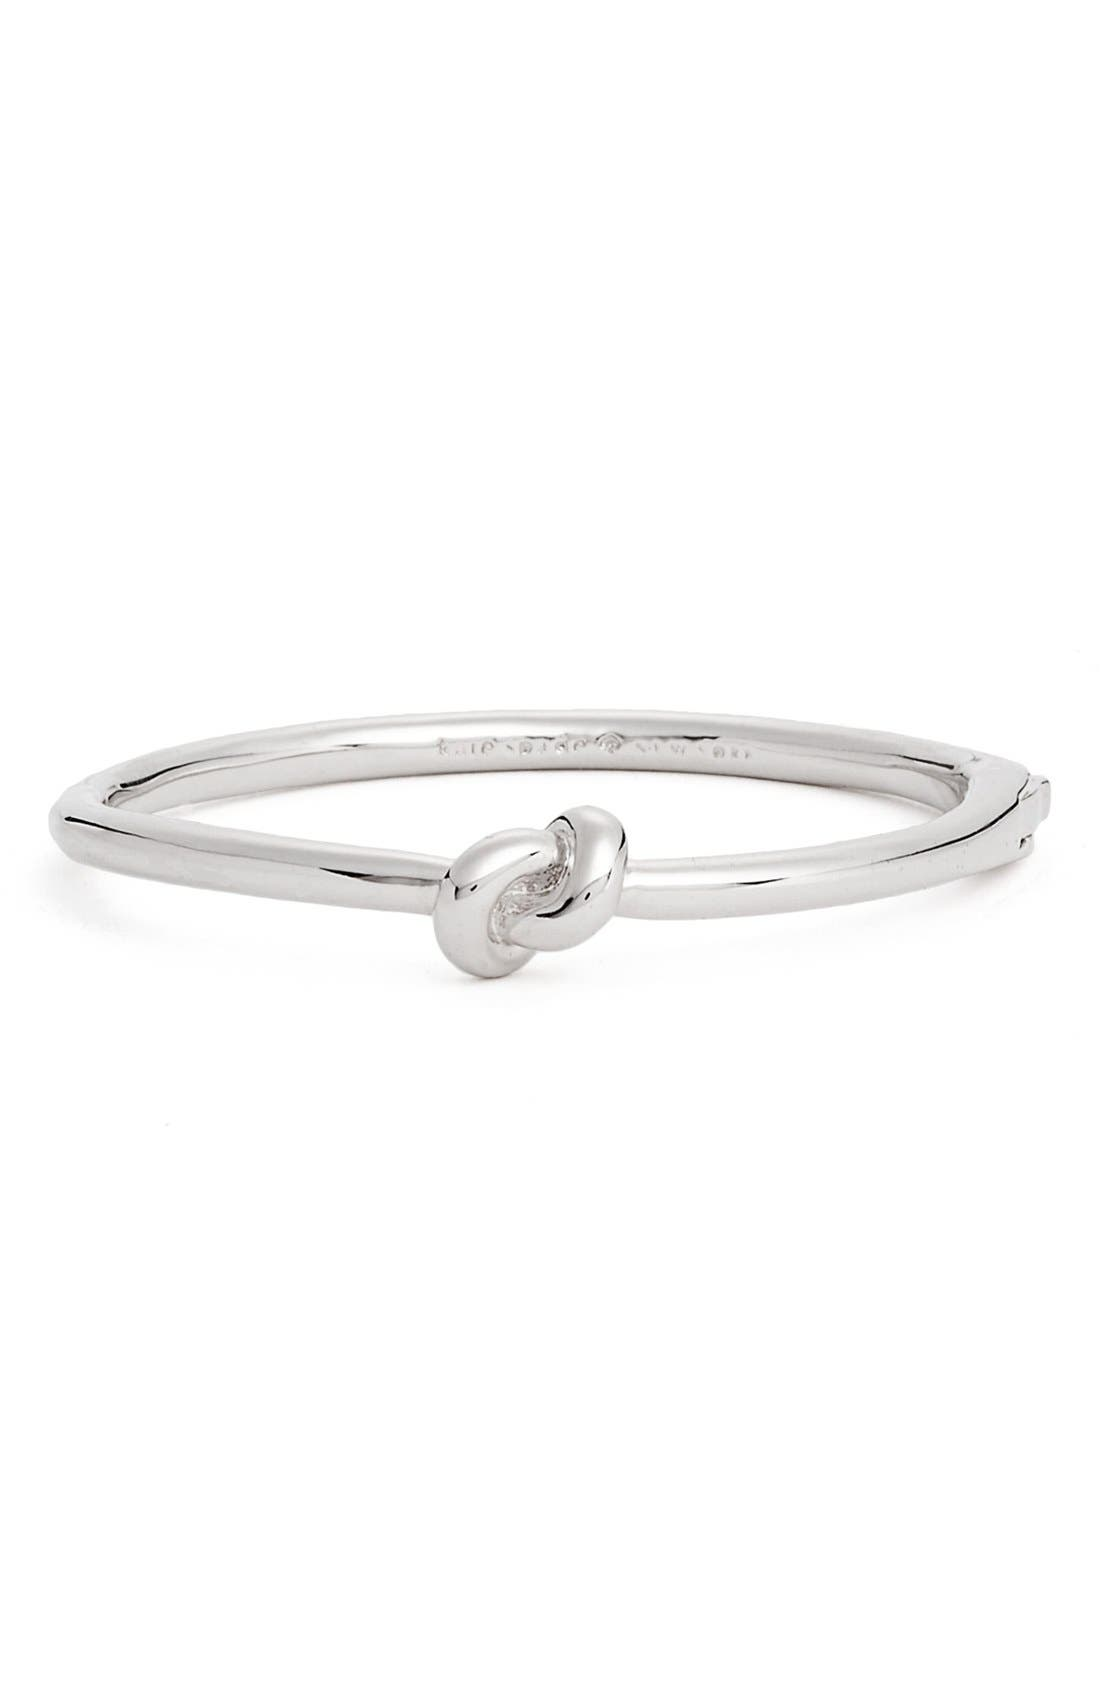 'sailors knot' bangle,                         Main,                         color, Silver